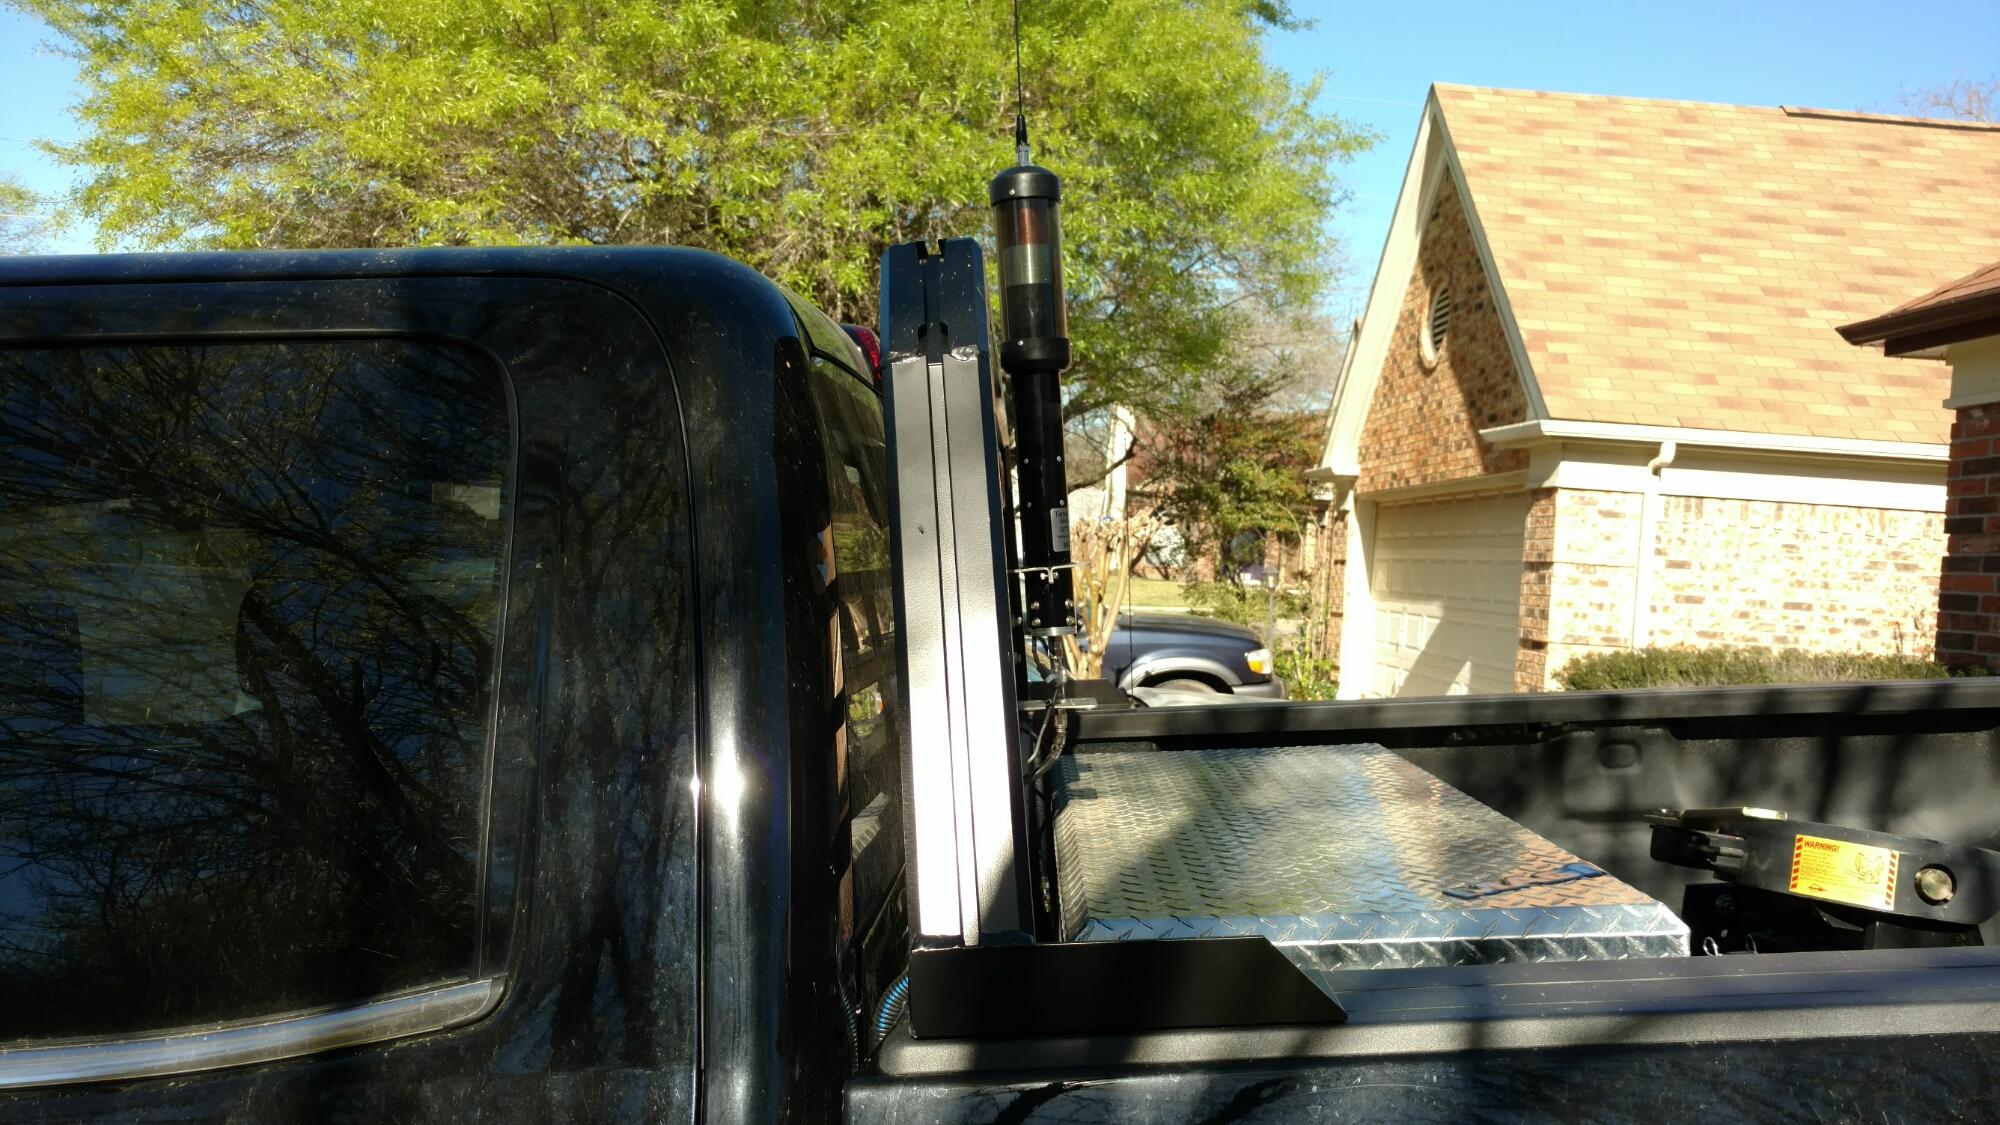 Headache Rack - Chevy and GMC Duramax Diesel Forum